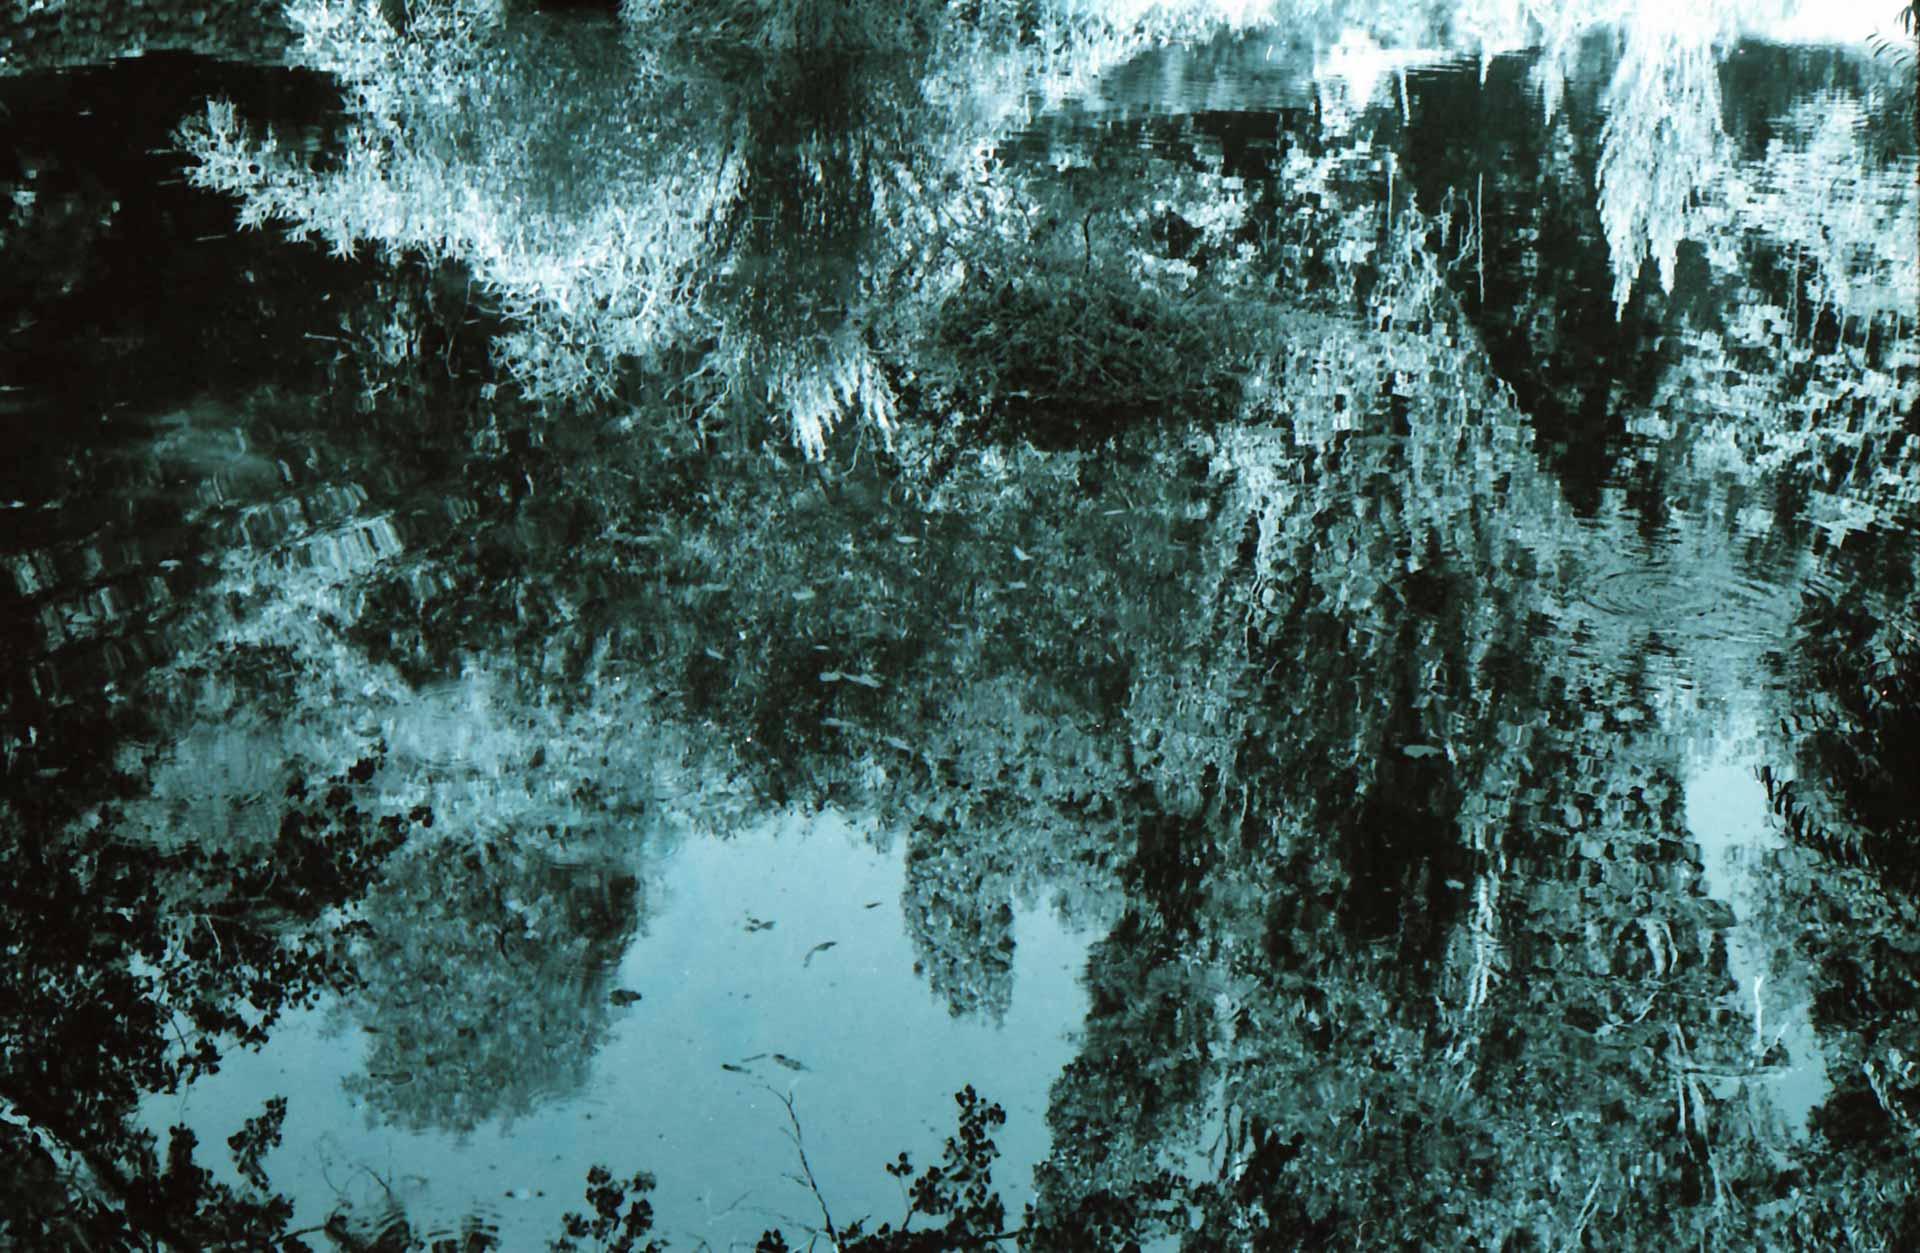 Natural equivalences n°2- San Leonardo de Siete Fuentes 2005